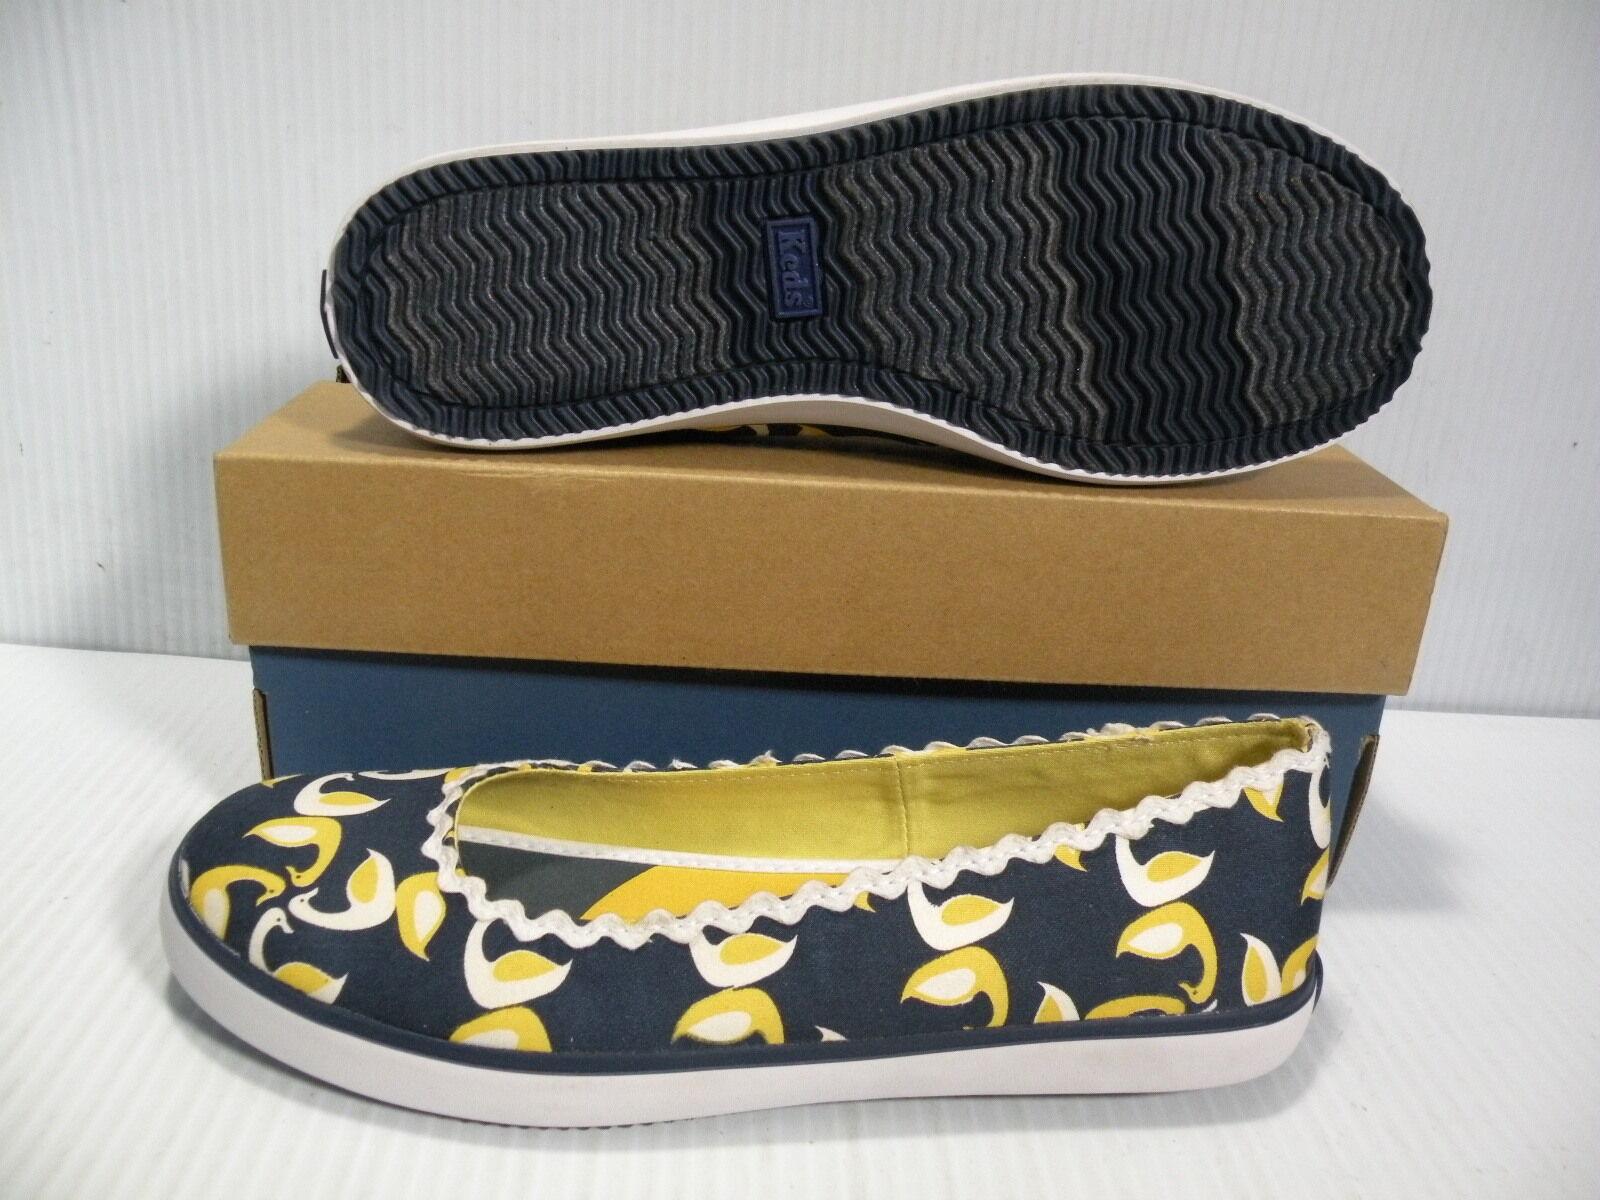 KEDS ELEANOR LOW WOMEN 7.5 Schuhe Blau DUCK WF19846 SIZE 7.5 WOMEN NEW 9dc9c6